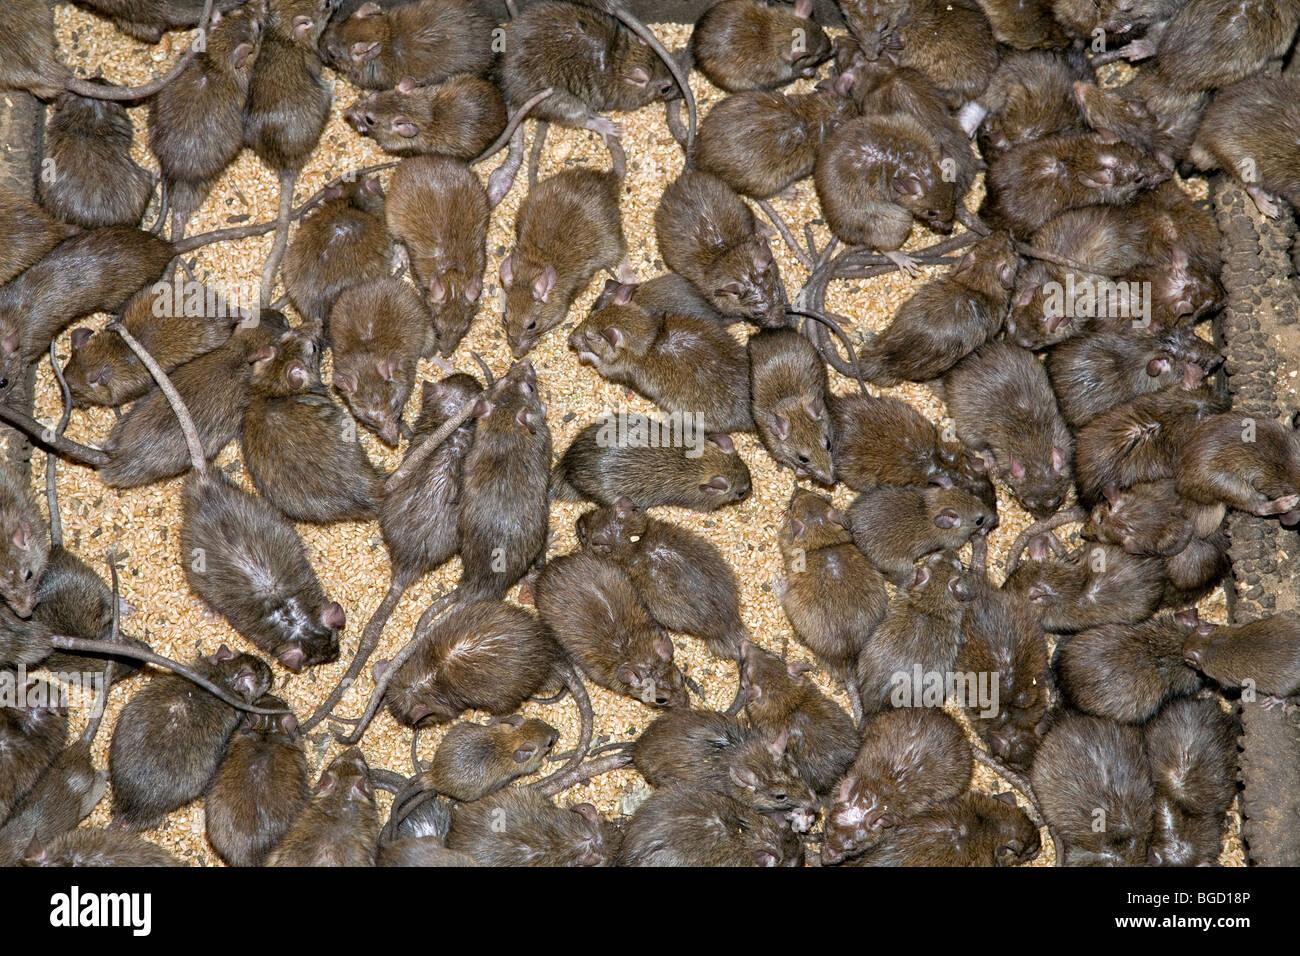 Ratten. Karni Mata Tempel. Deshnok. In der Nähe von Bikaner. Rajasthan. Indien Stockbild